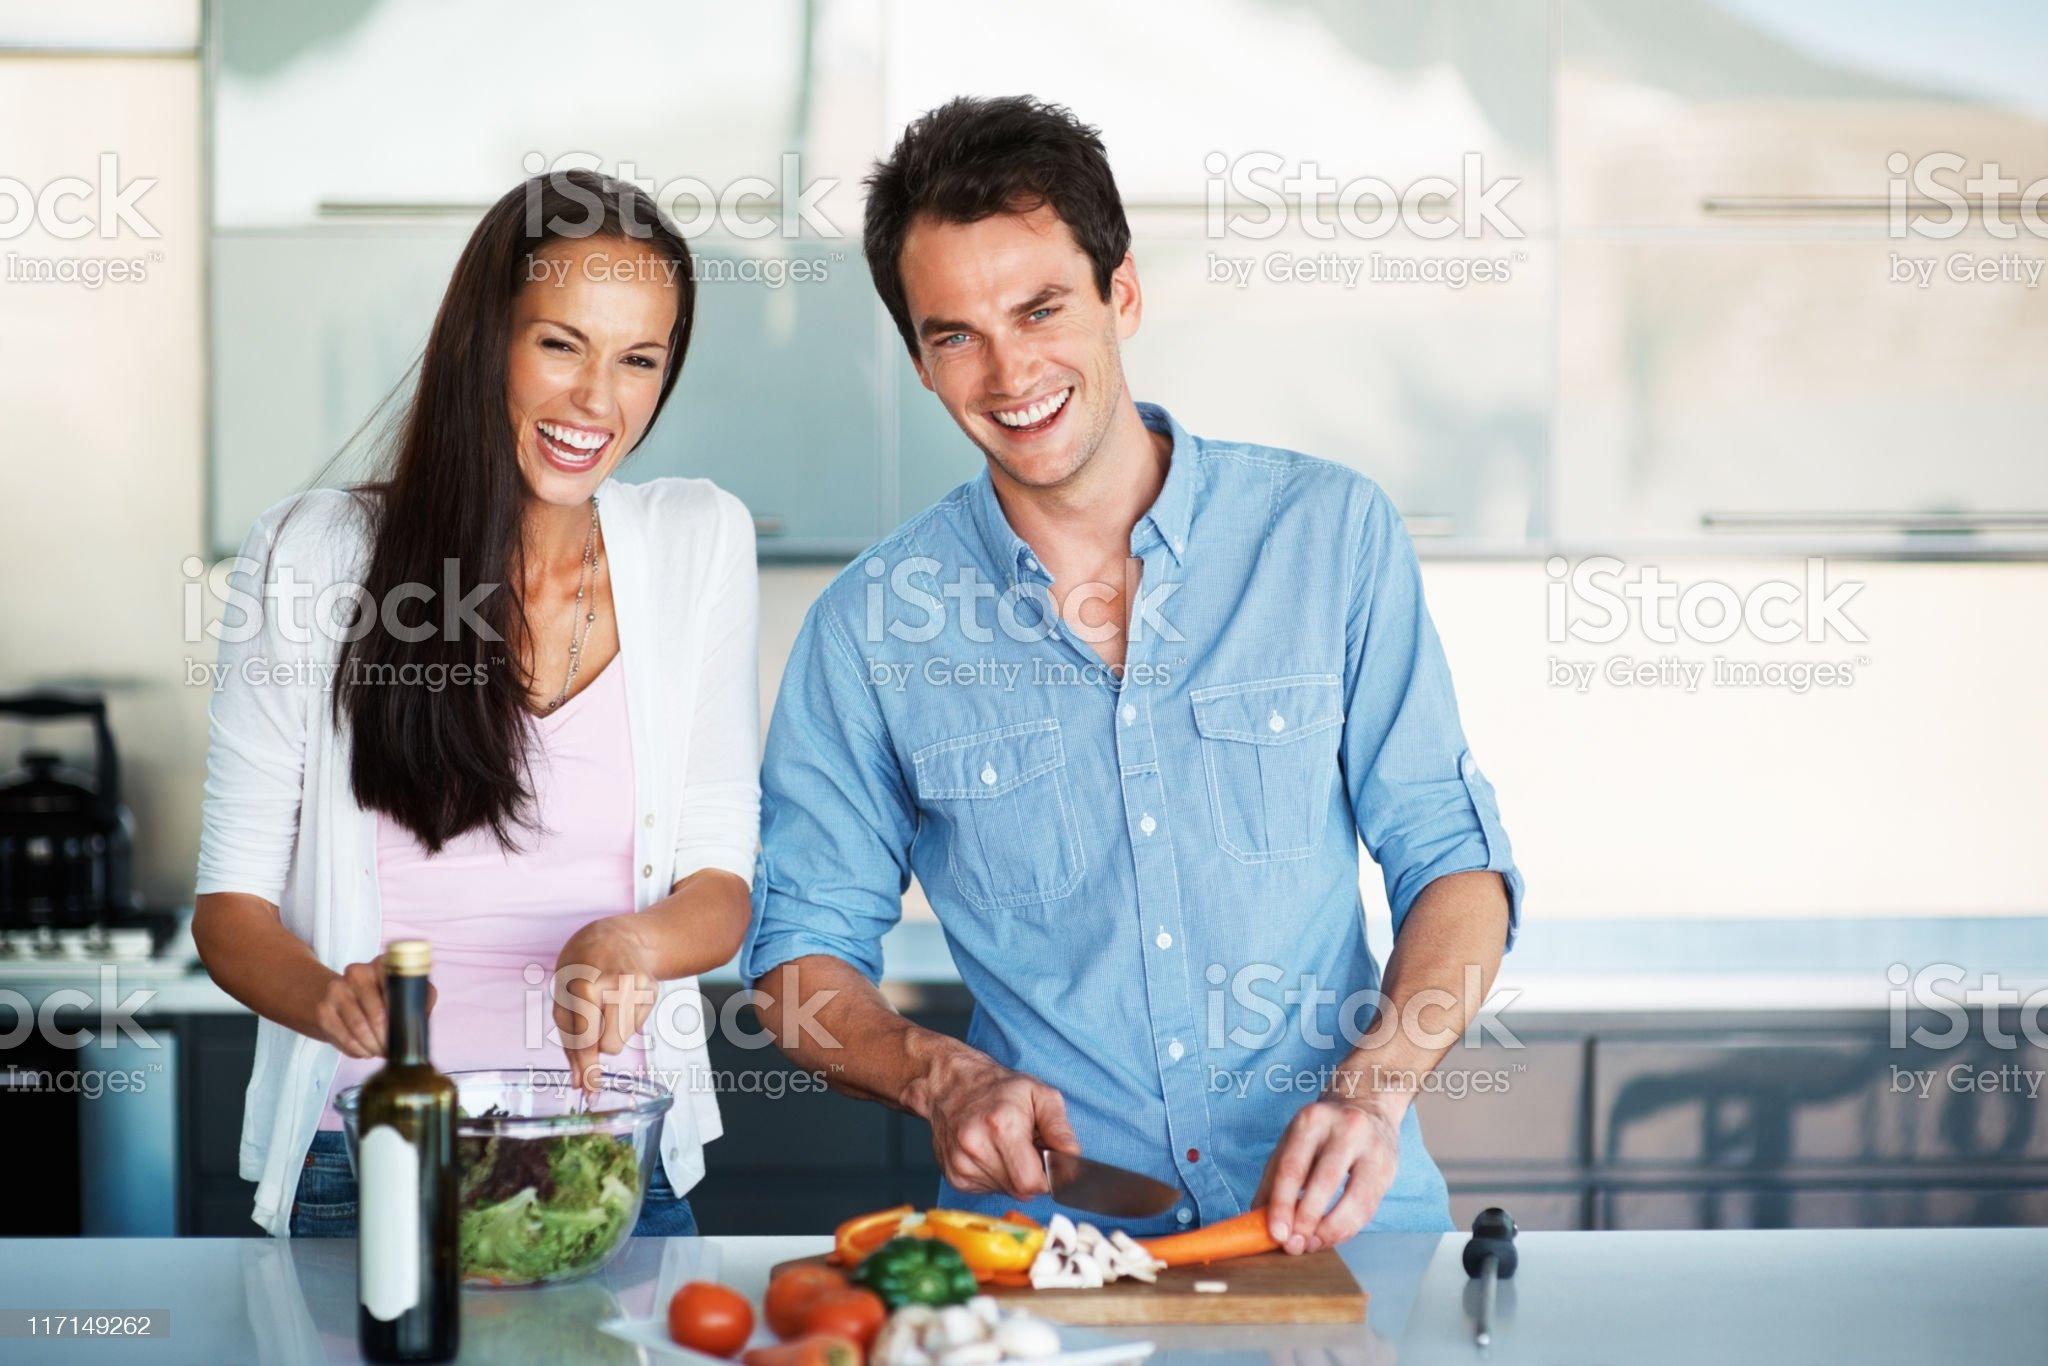 Beautiful couple having fun in the kitchen royalty-free stock photo